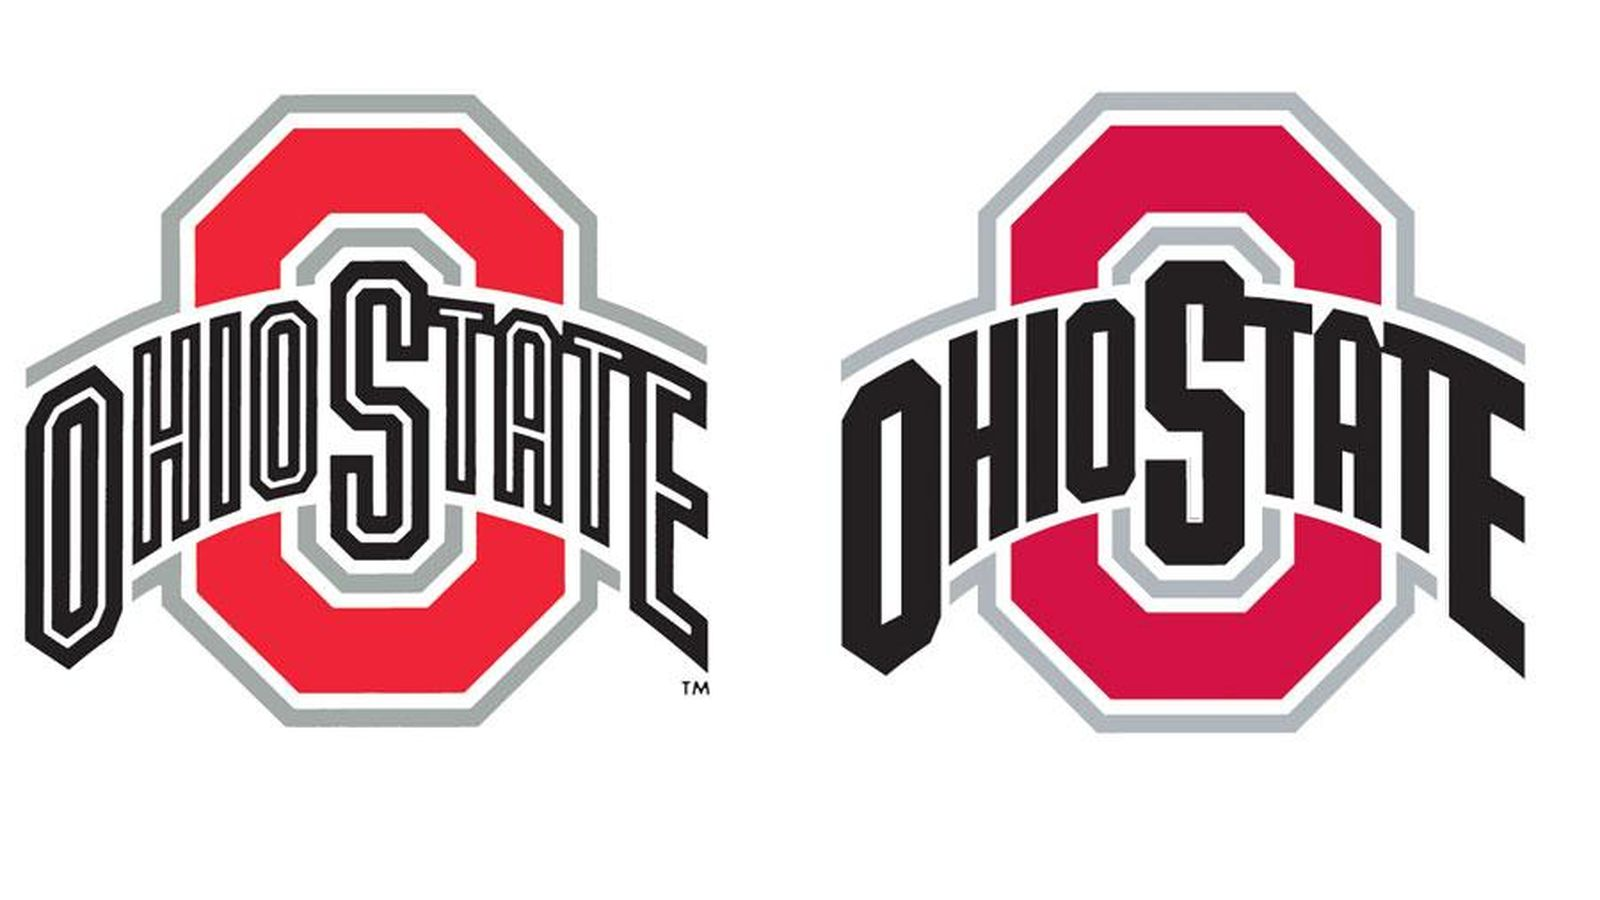 New Ohio State logos cost school $45,000.